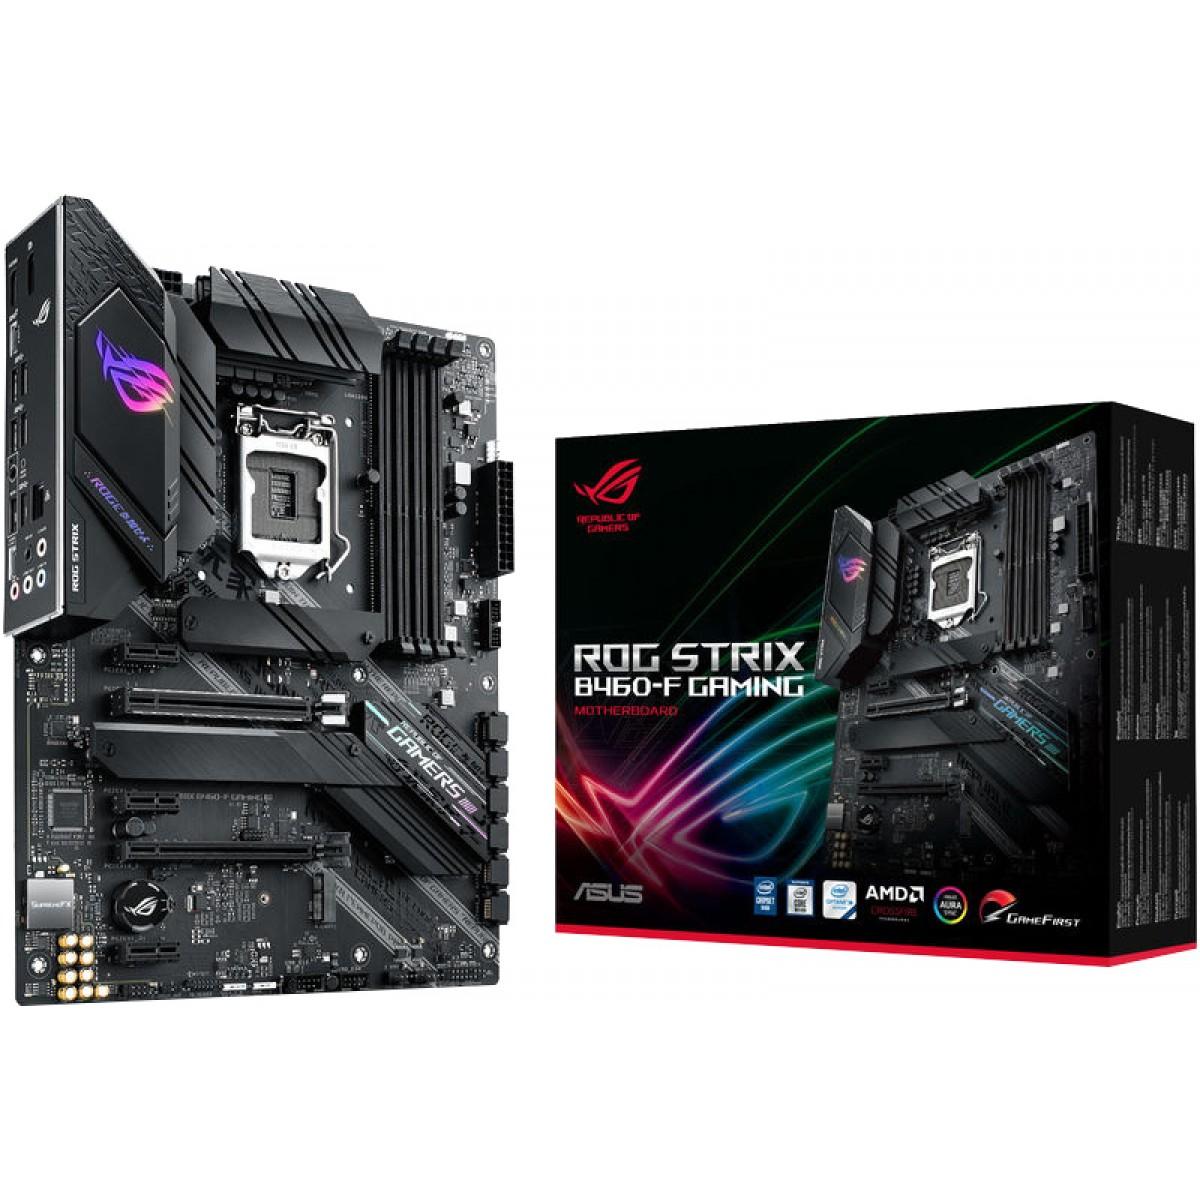 Placa Mãe Asus Rog Strix B460-F Gaming, Chipset B460, Intel LGA 1200, ATX, DDR4